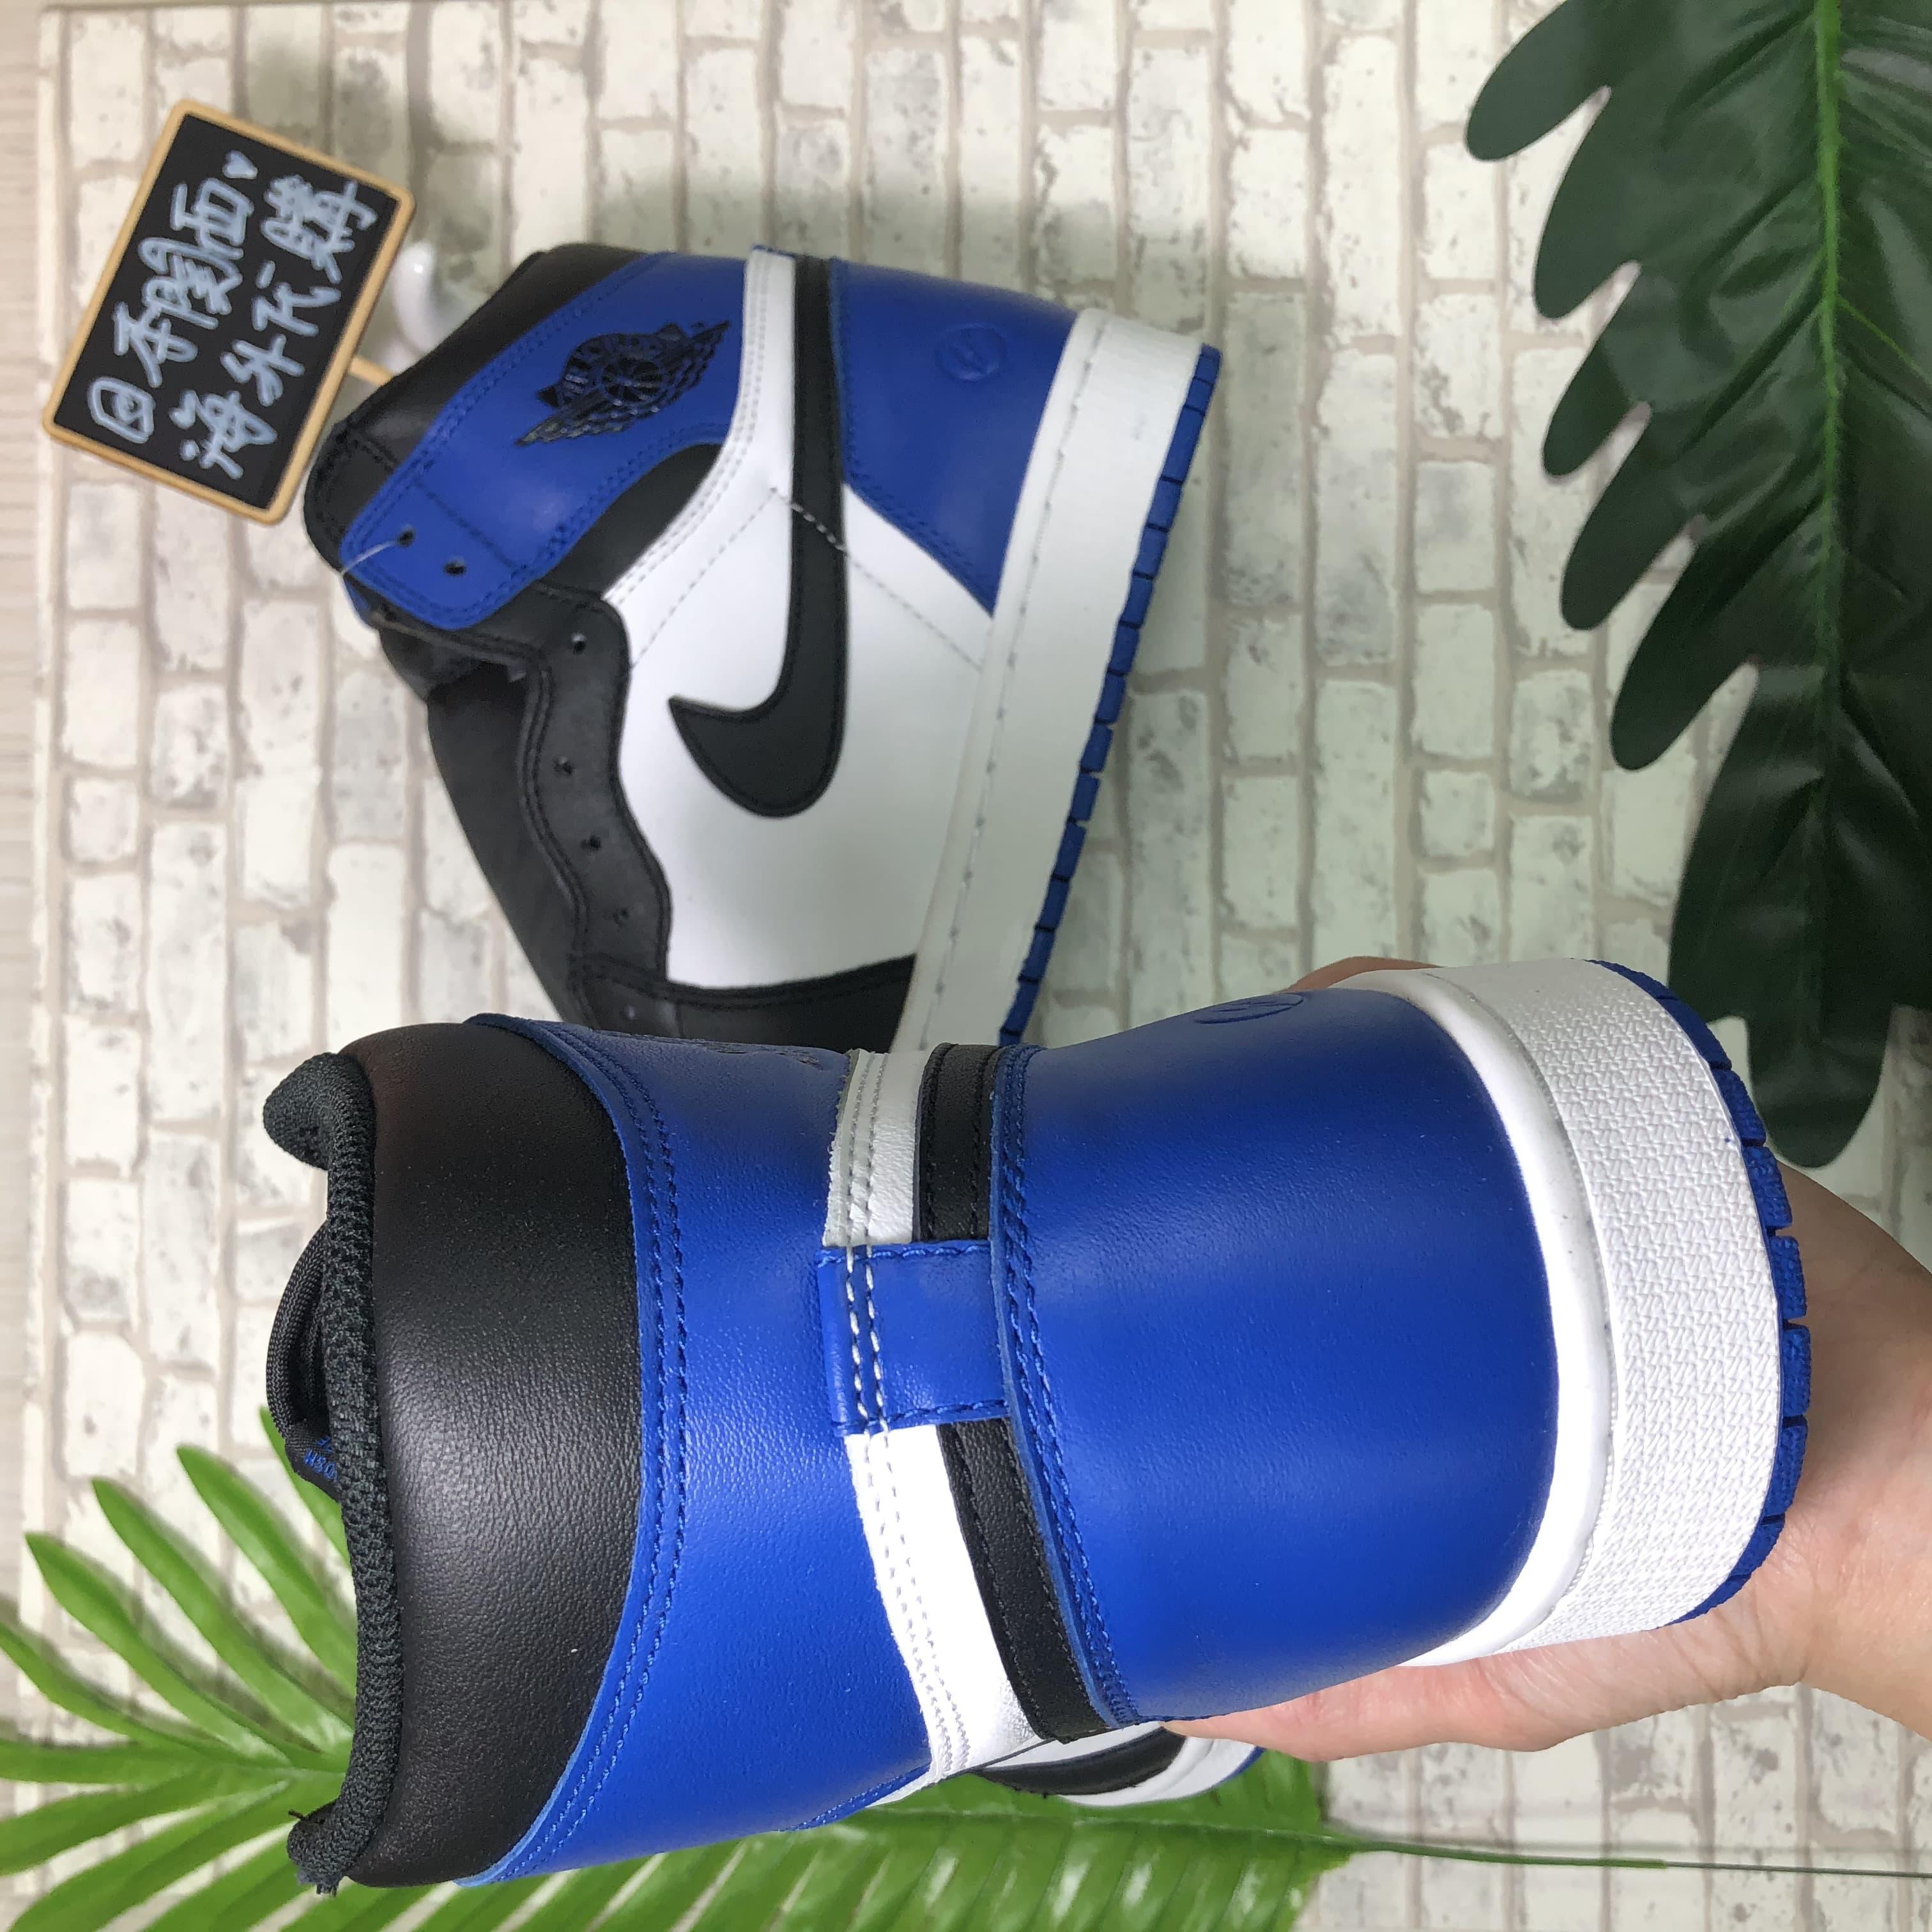 NIKE Air Jordan 1 x Fragment Design 聯名 閃電 藤原浩 白黑 716371-040